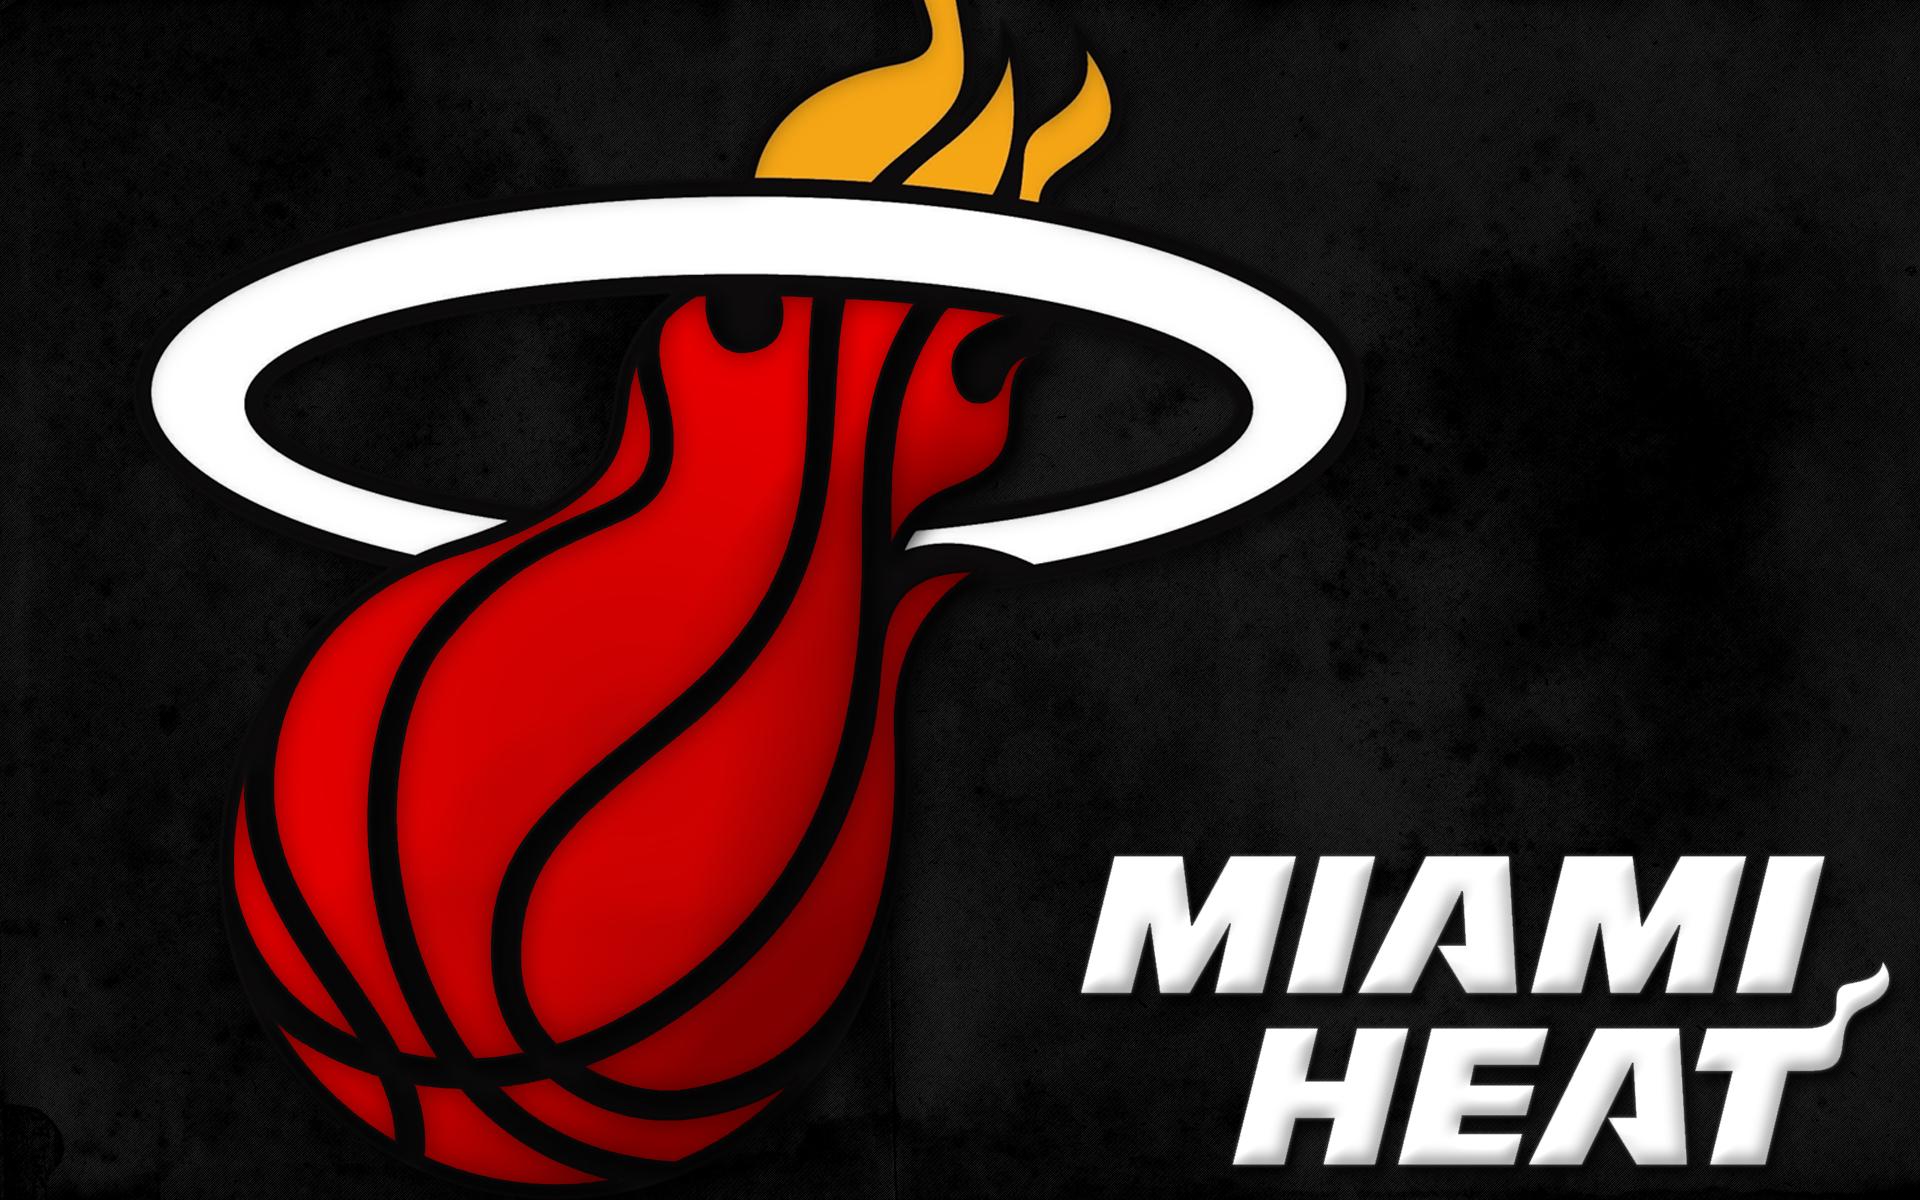 Miami Heat Logo Wallpaper ImageBankbiz 1920x1200